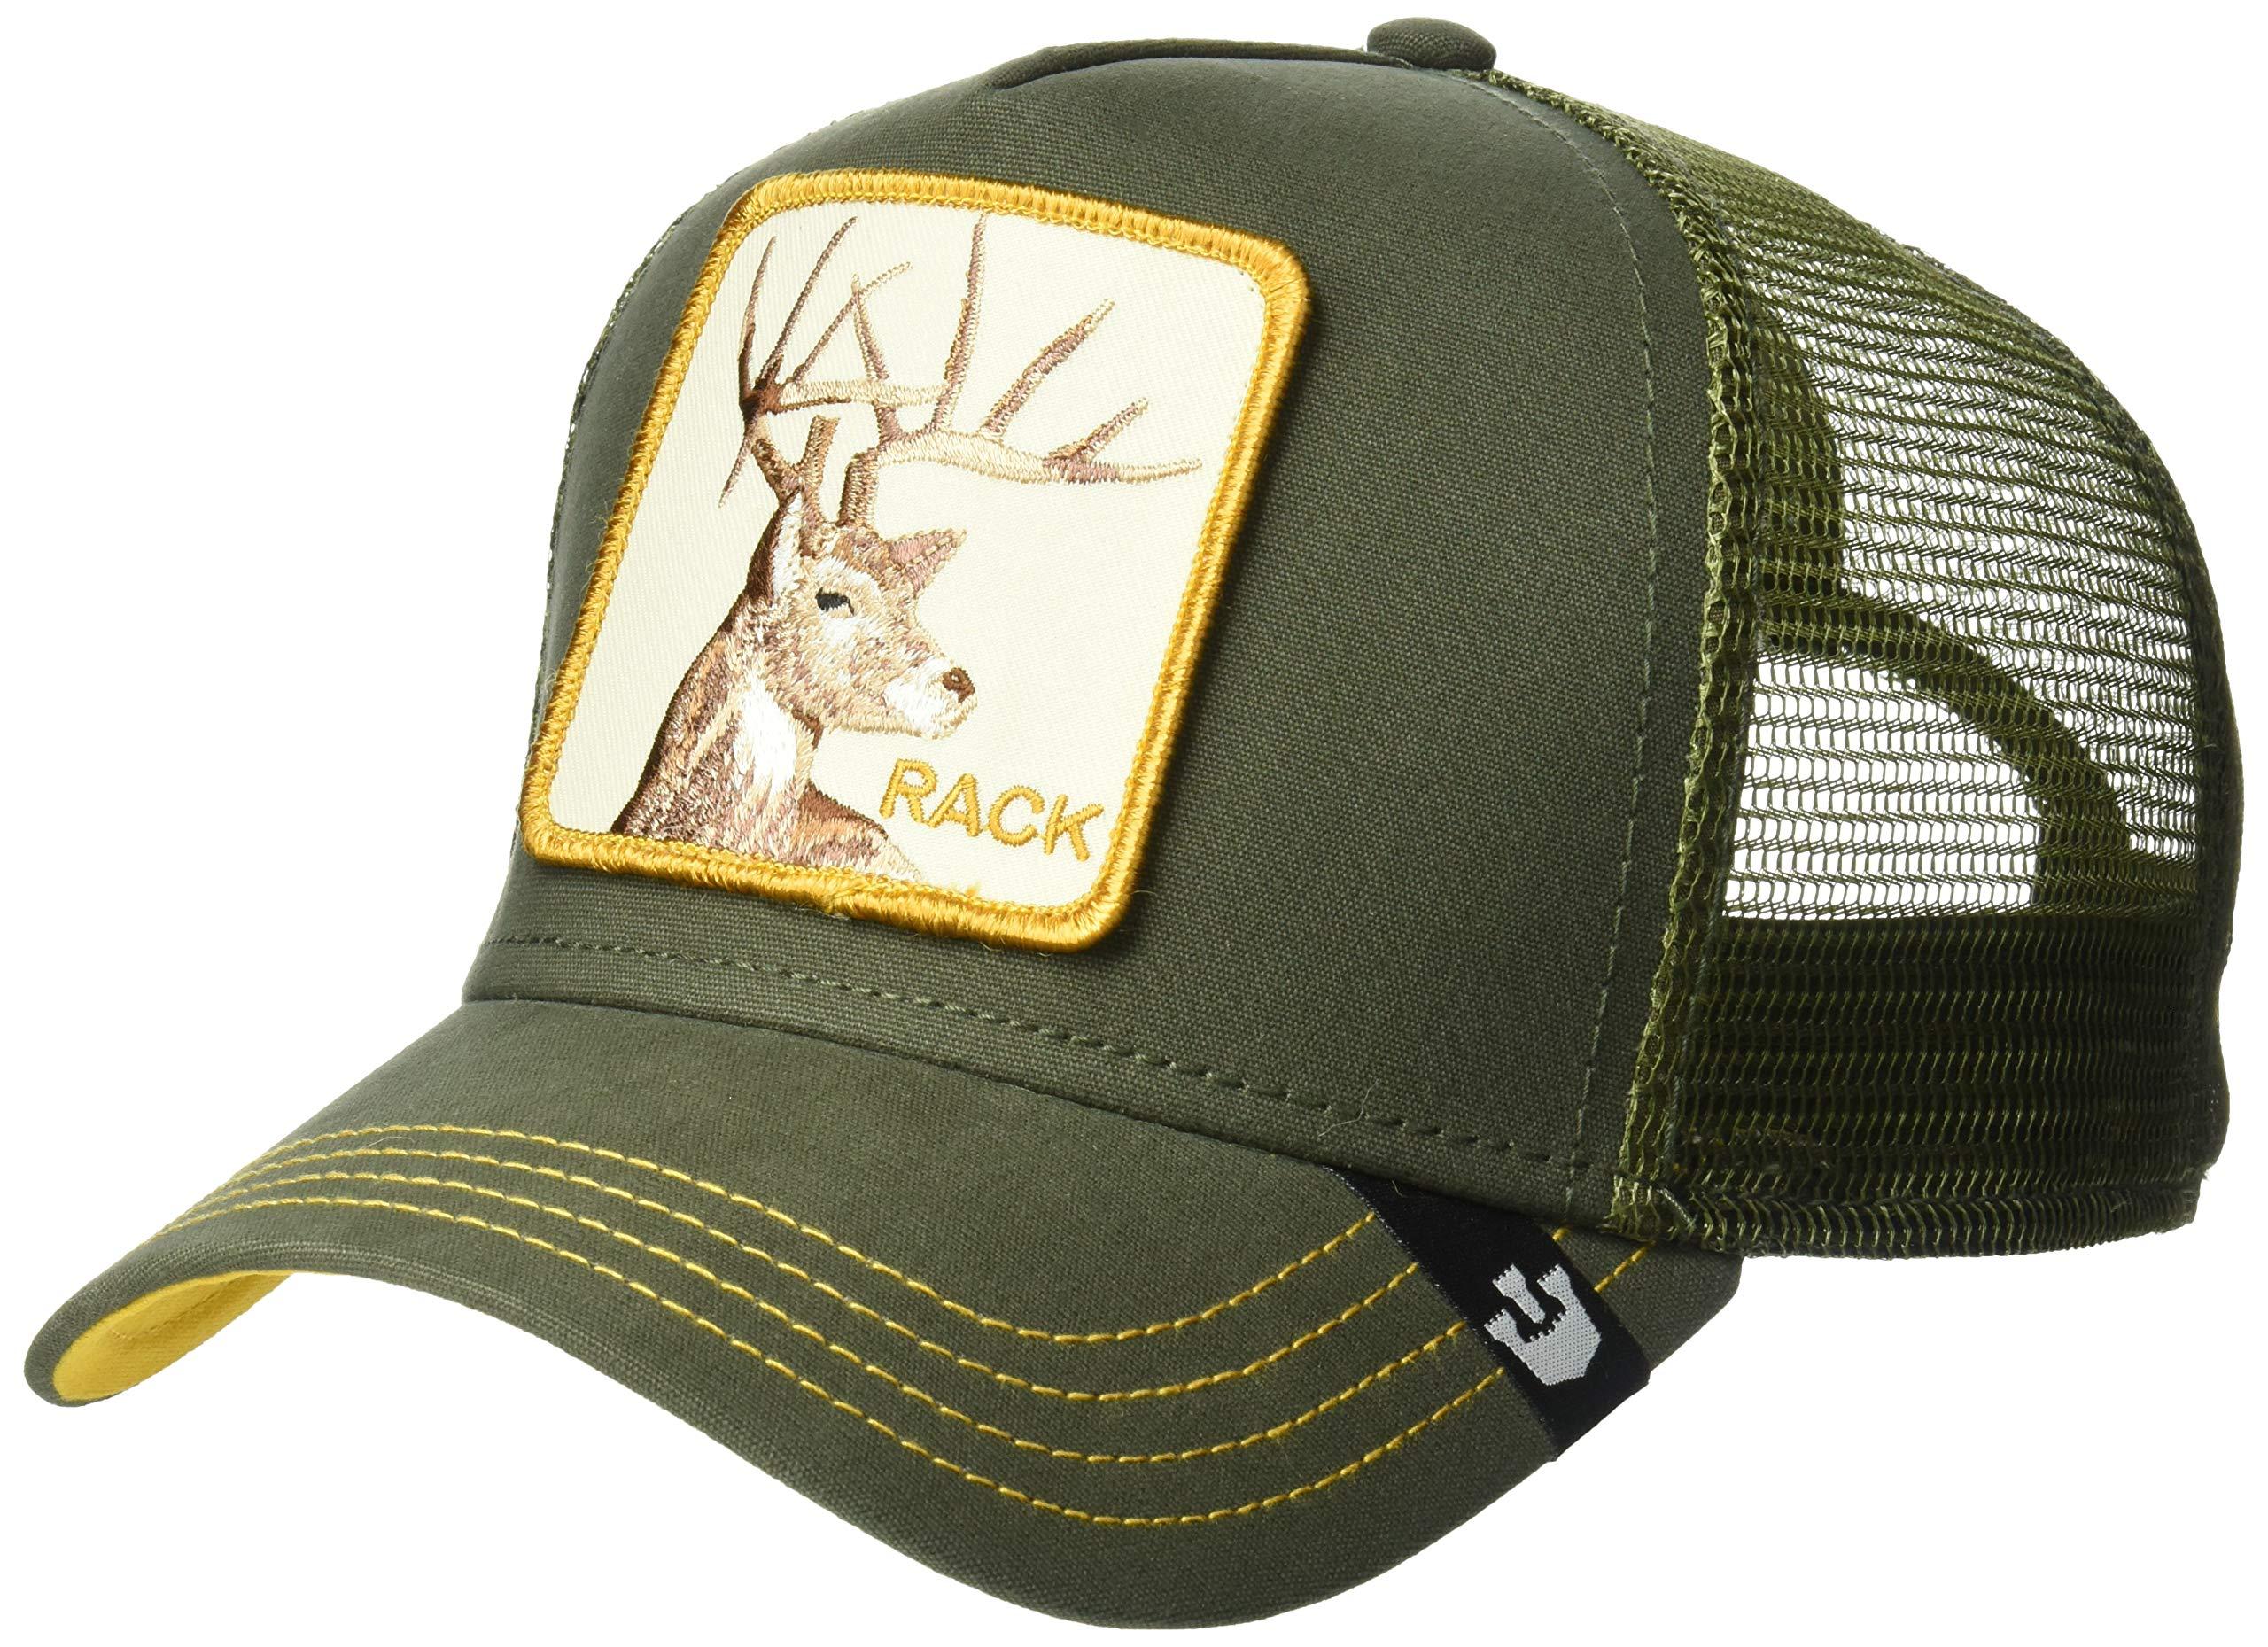 c4883b95aa5af5 Galleon - Goorin Bros. Men's Animal Farm Trucker Hat, Green Deer, One Size